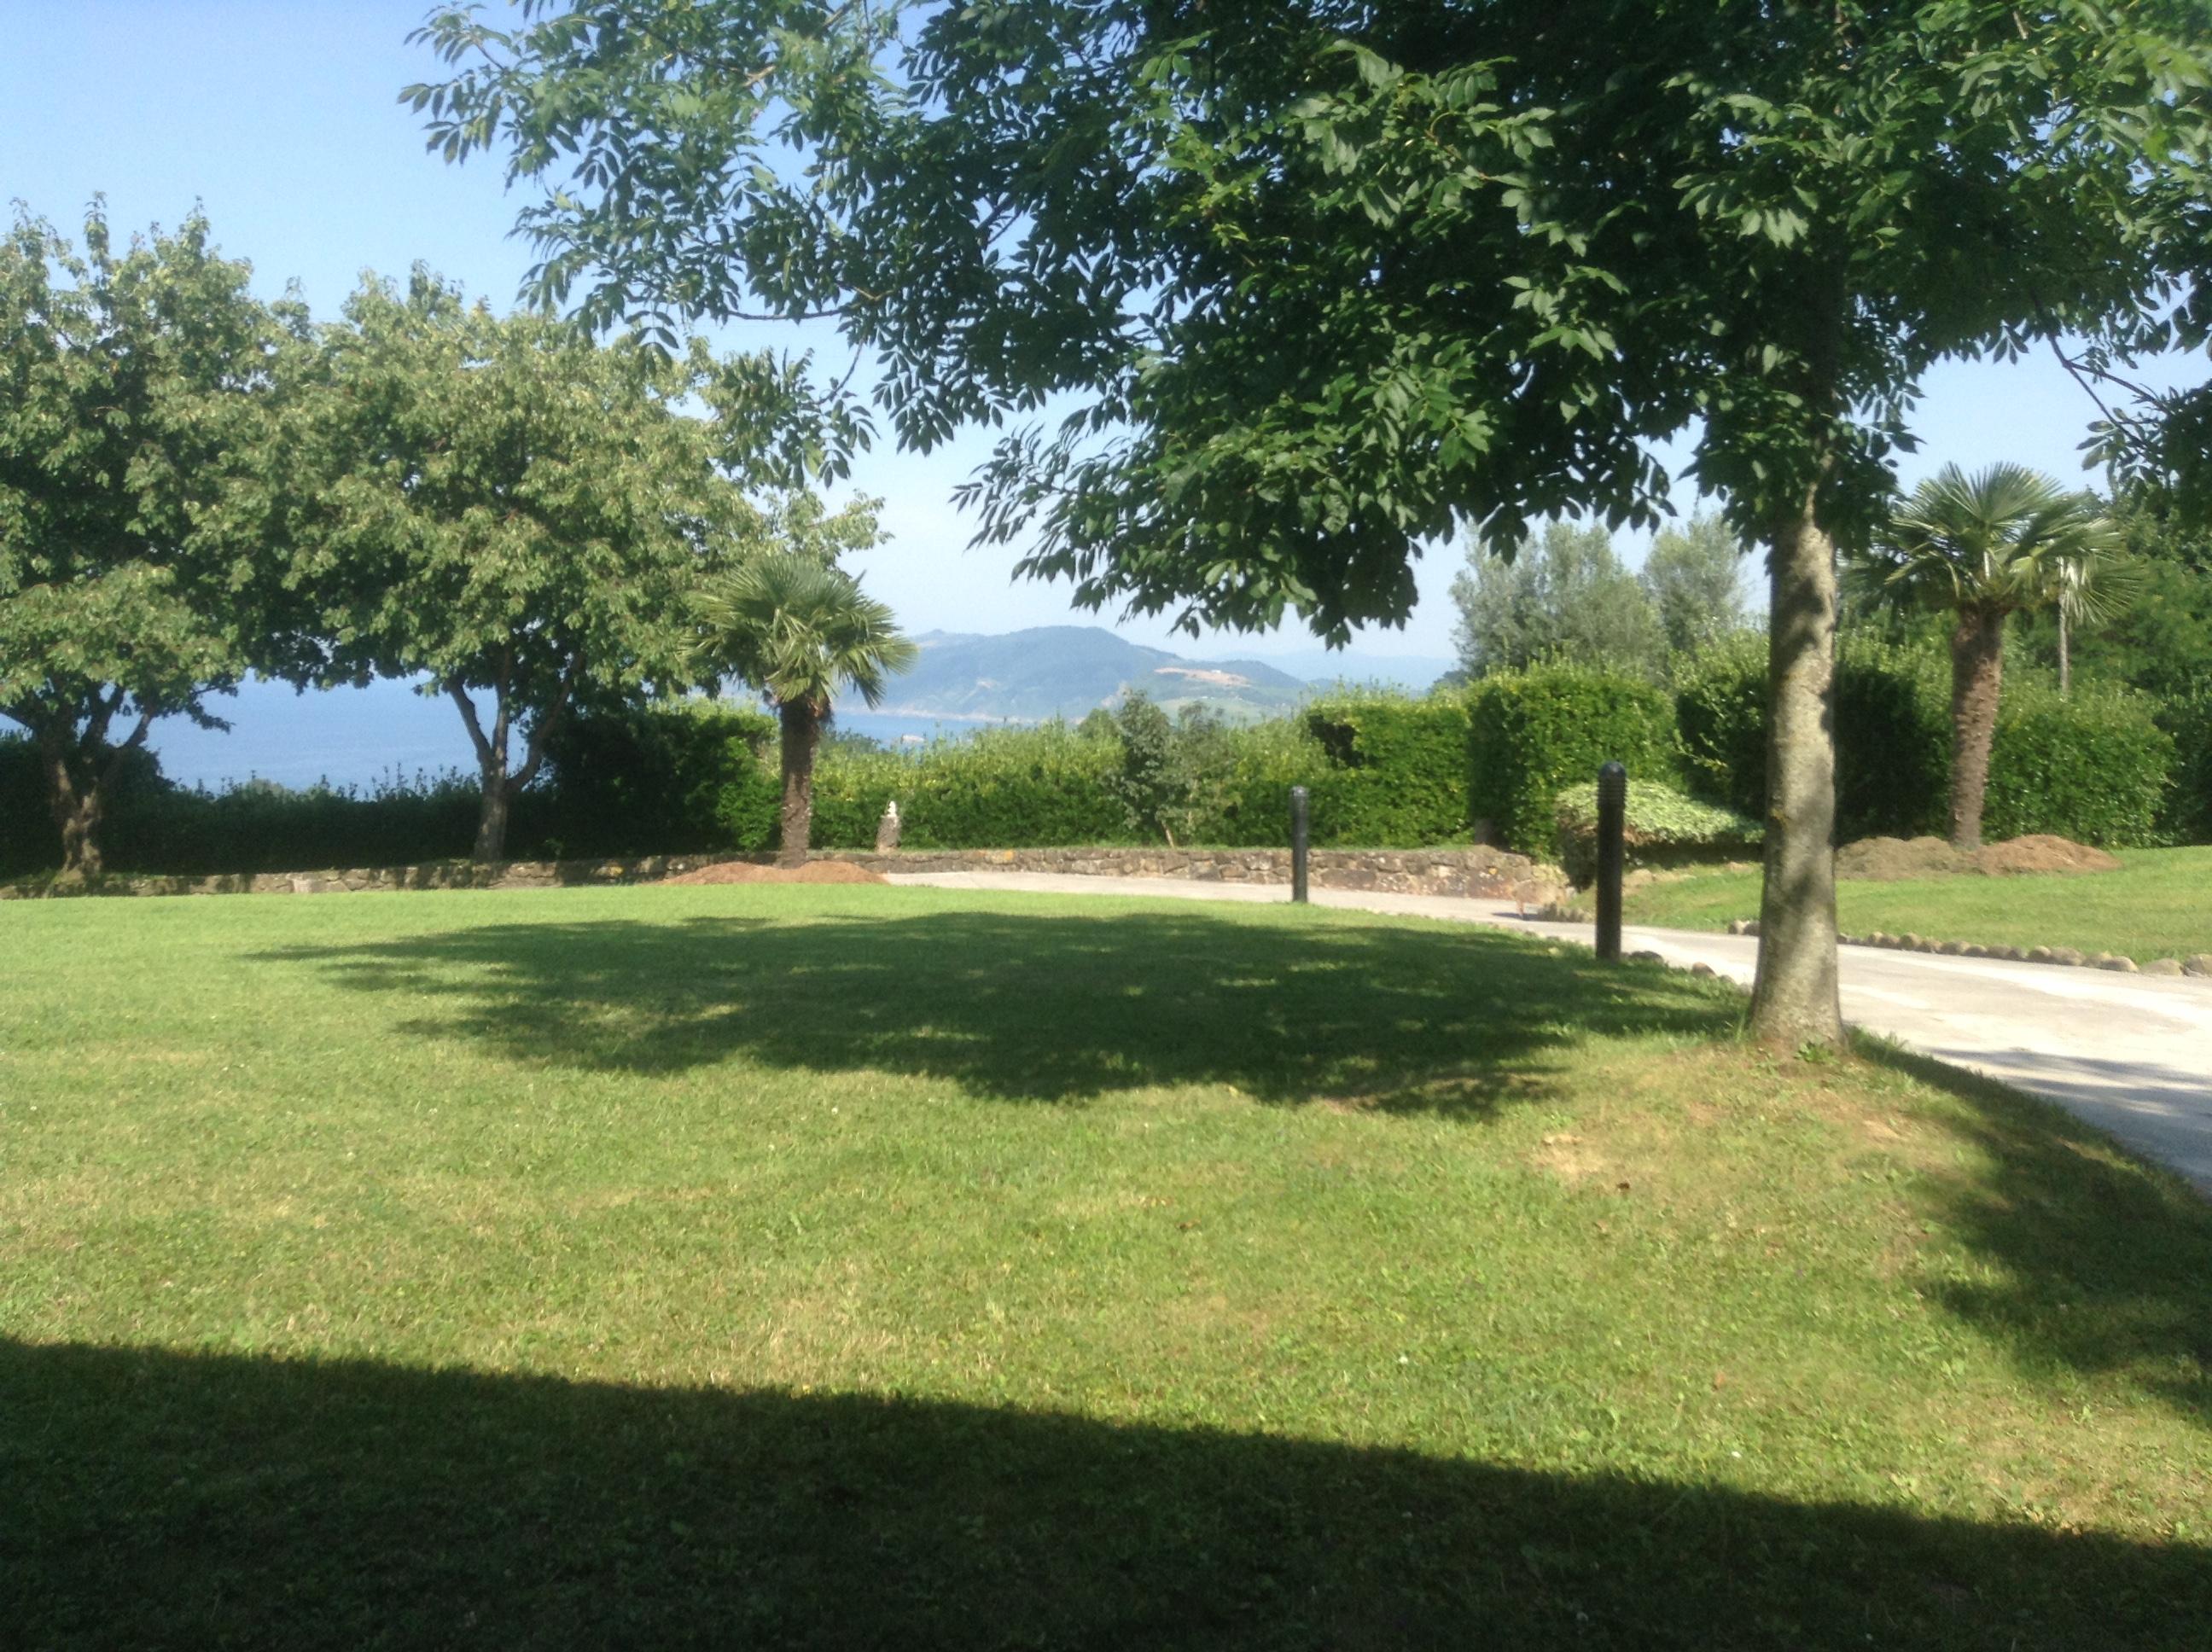 The view from the terrace of Mahastí, Epotx Etxea, Getaria, Pais Vasco